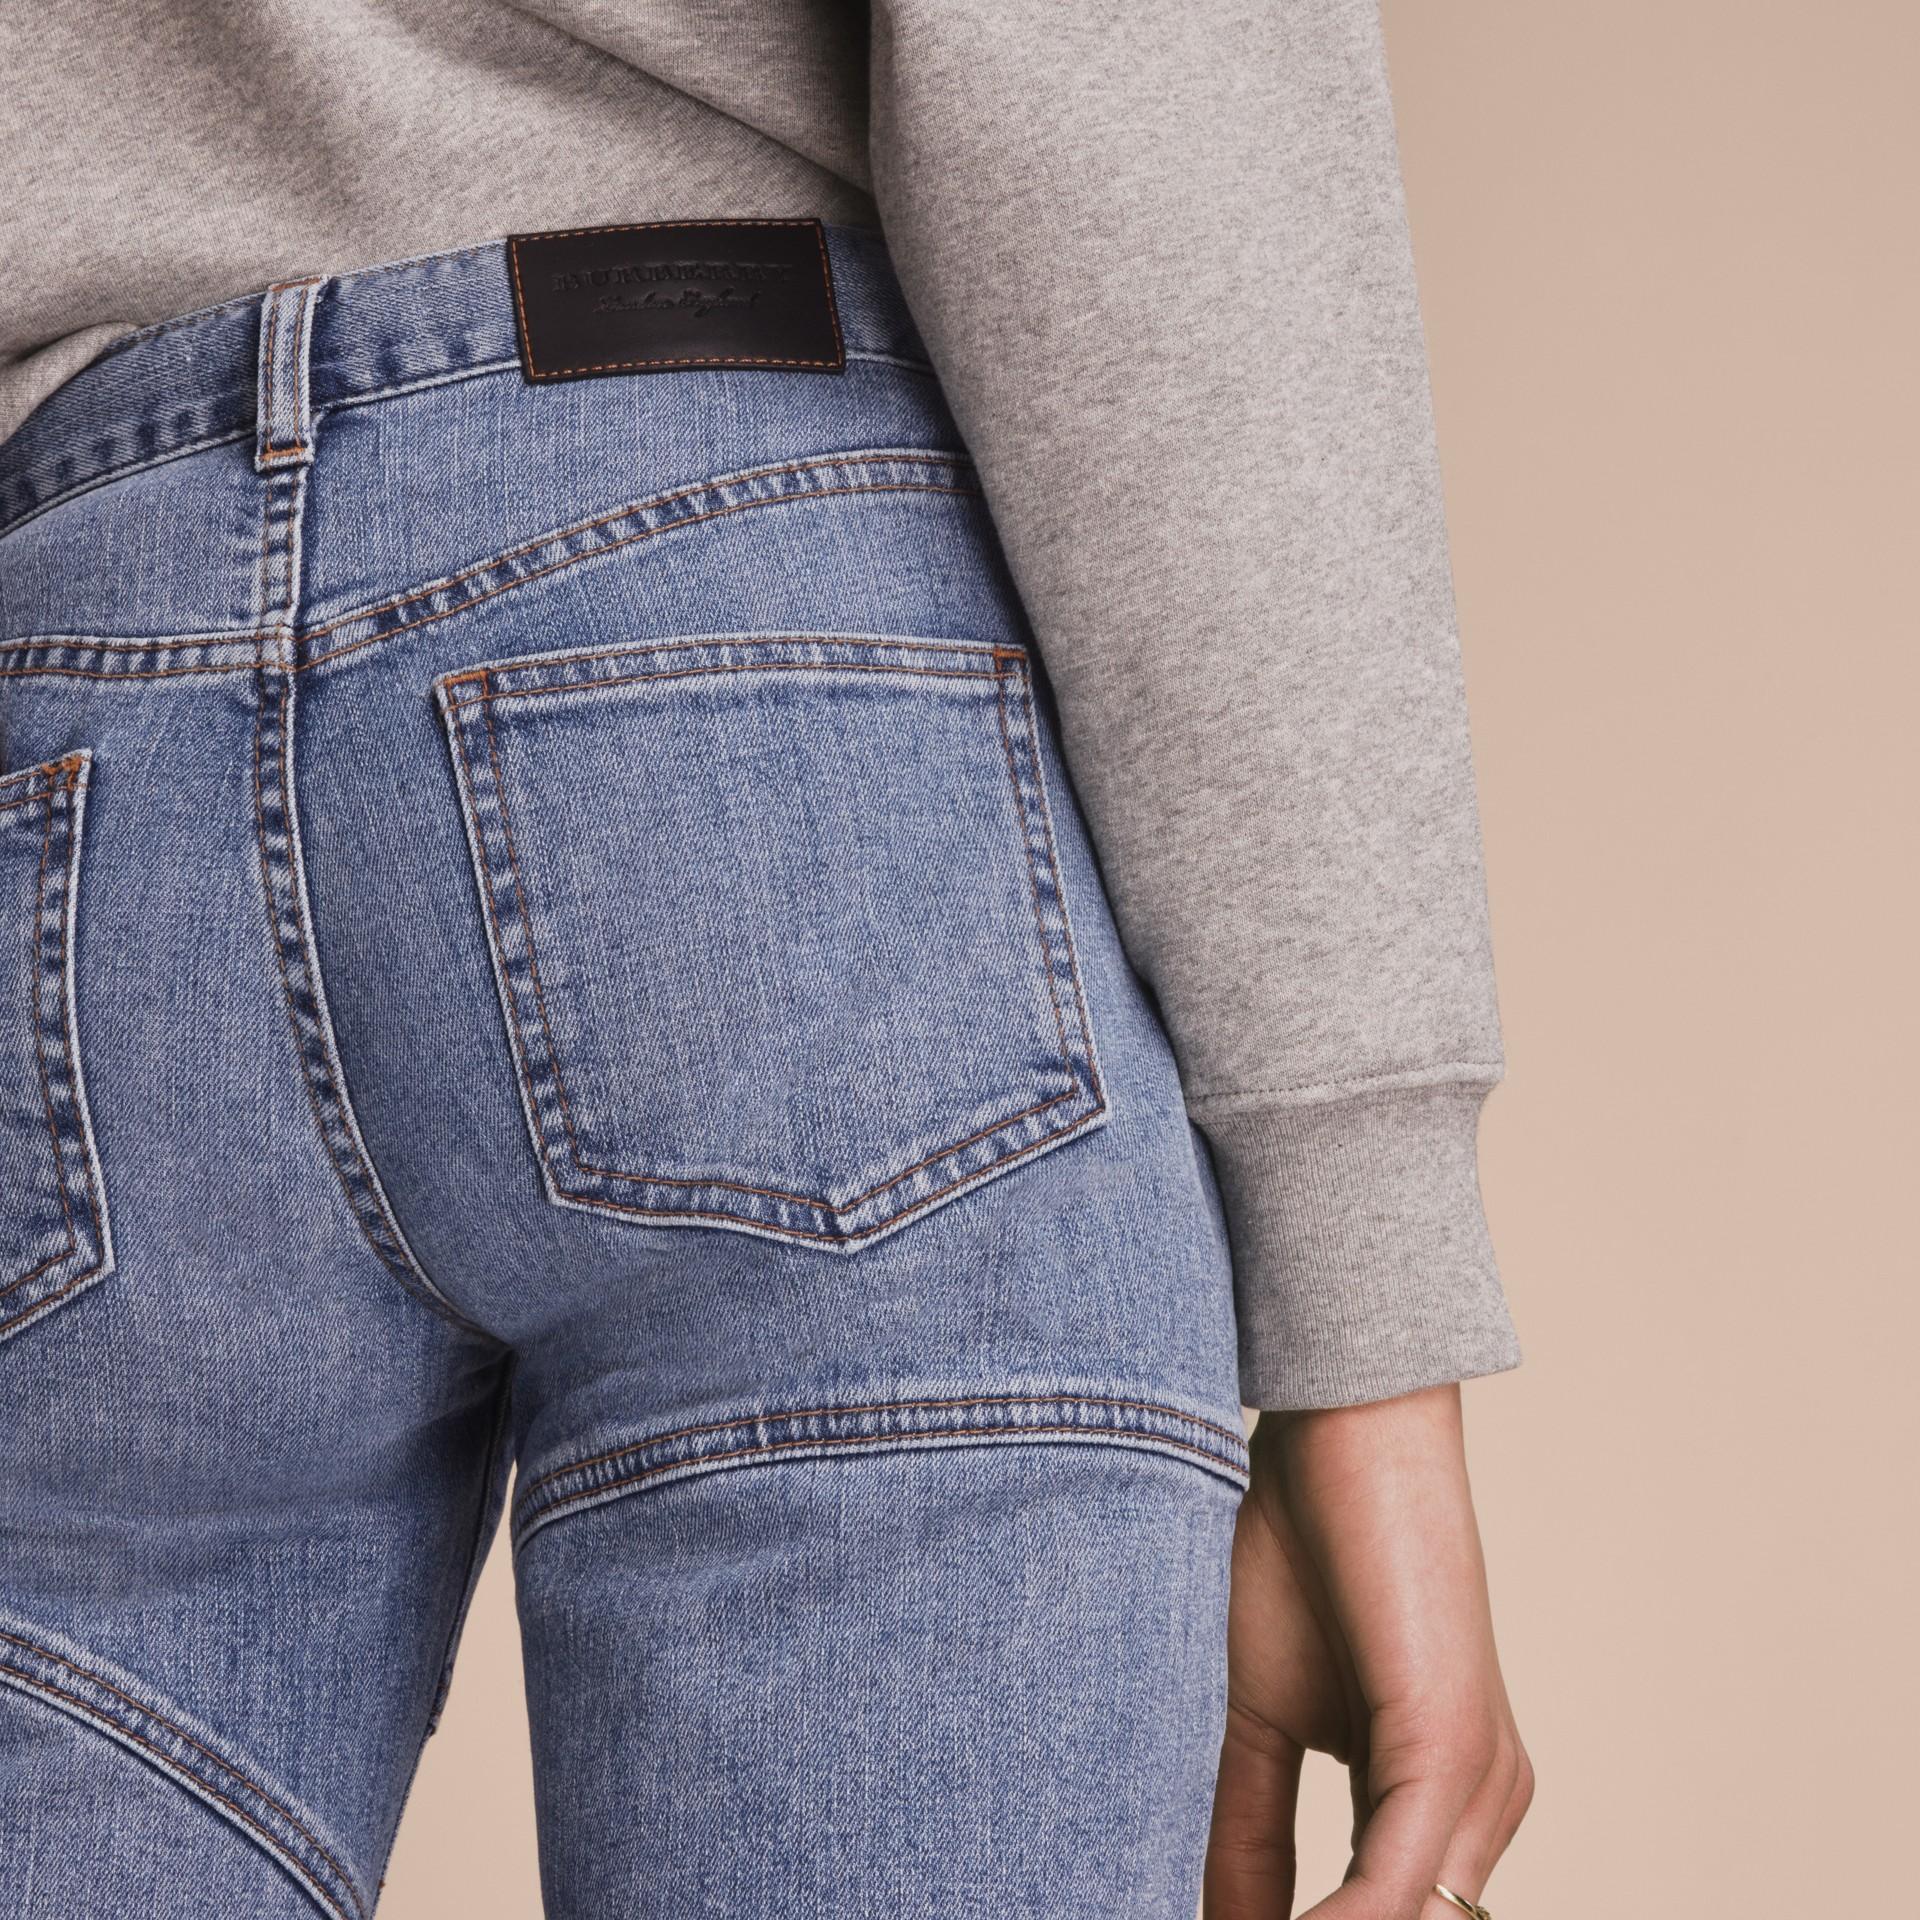 Slim Fit Seam Detail Japanese Denim Jeans - gallery image 6